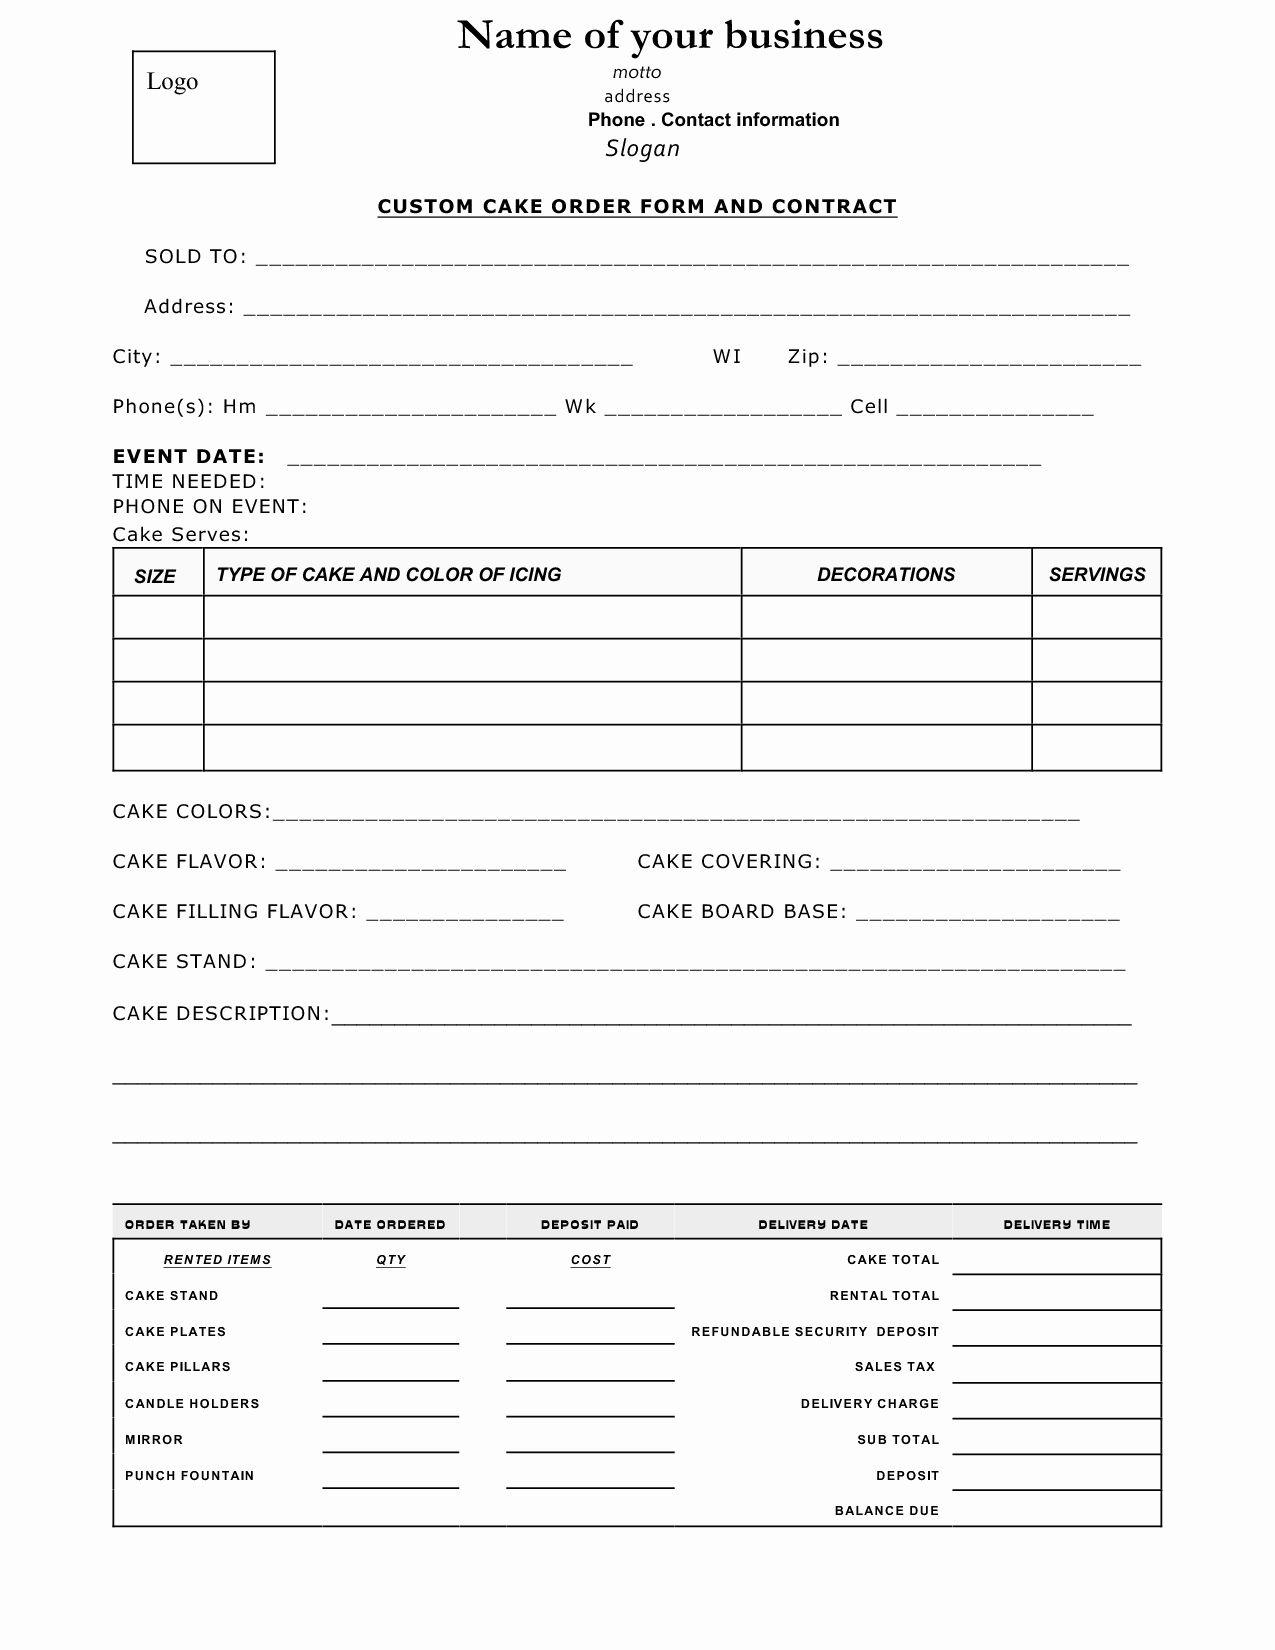 Cake Order Forms Printable Inspirational Cake Contract Sample Cakepins Wedding Cake Contract Cake Business Wedding Cake Order Form